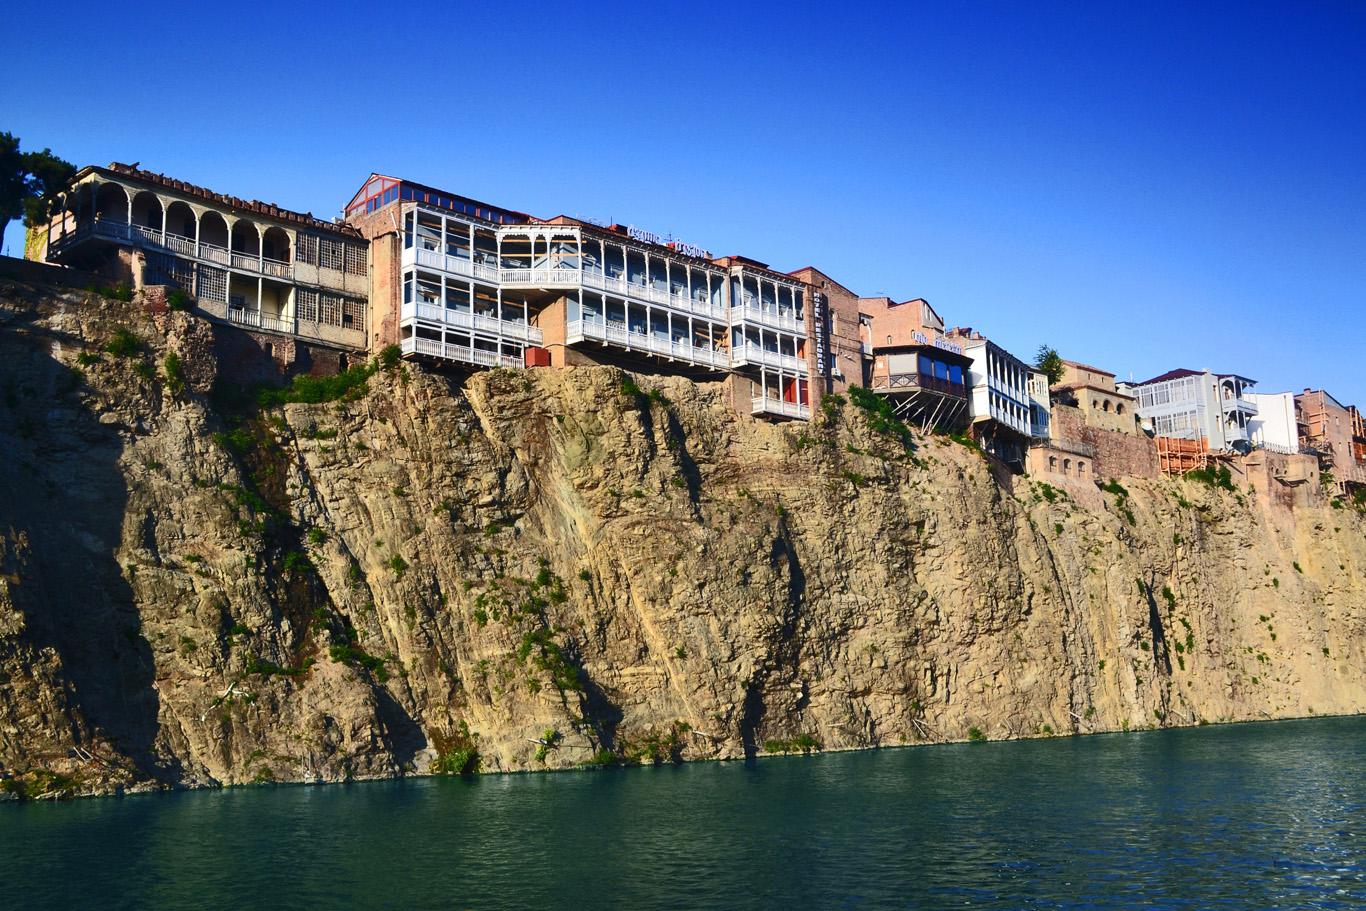 Balconies on the cliffs over Kura river